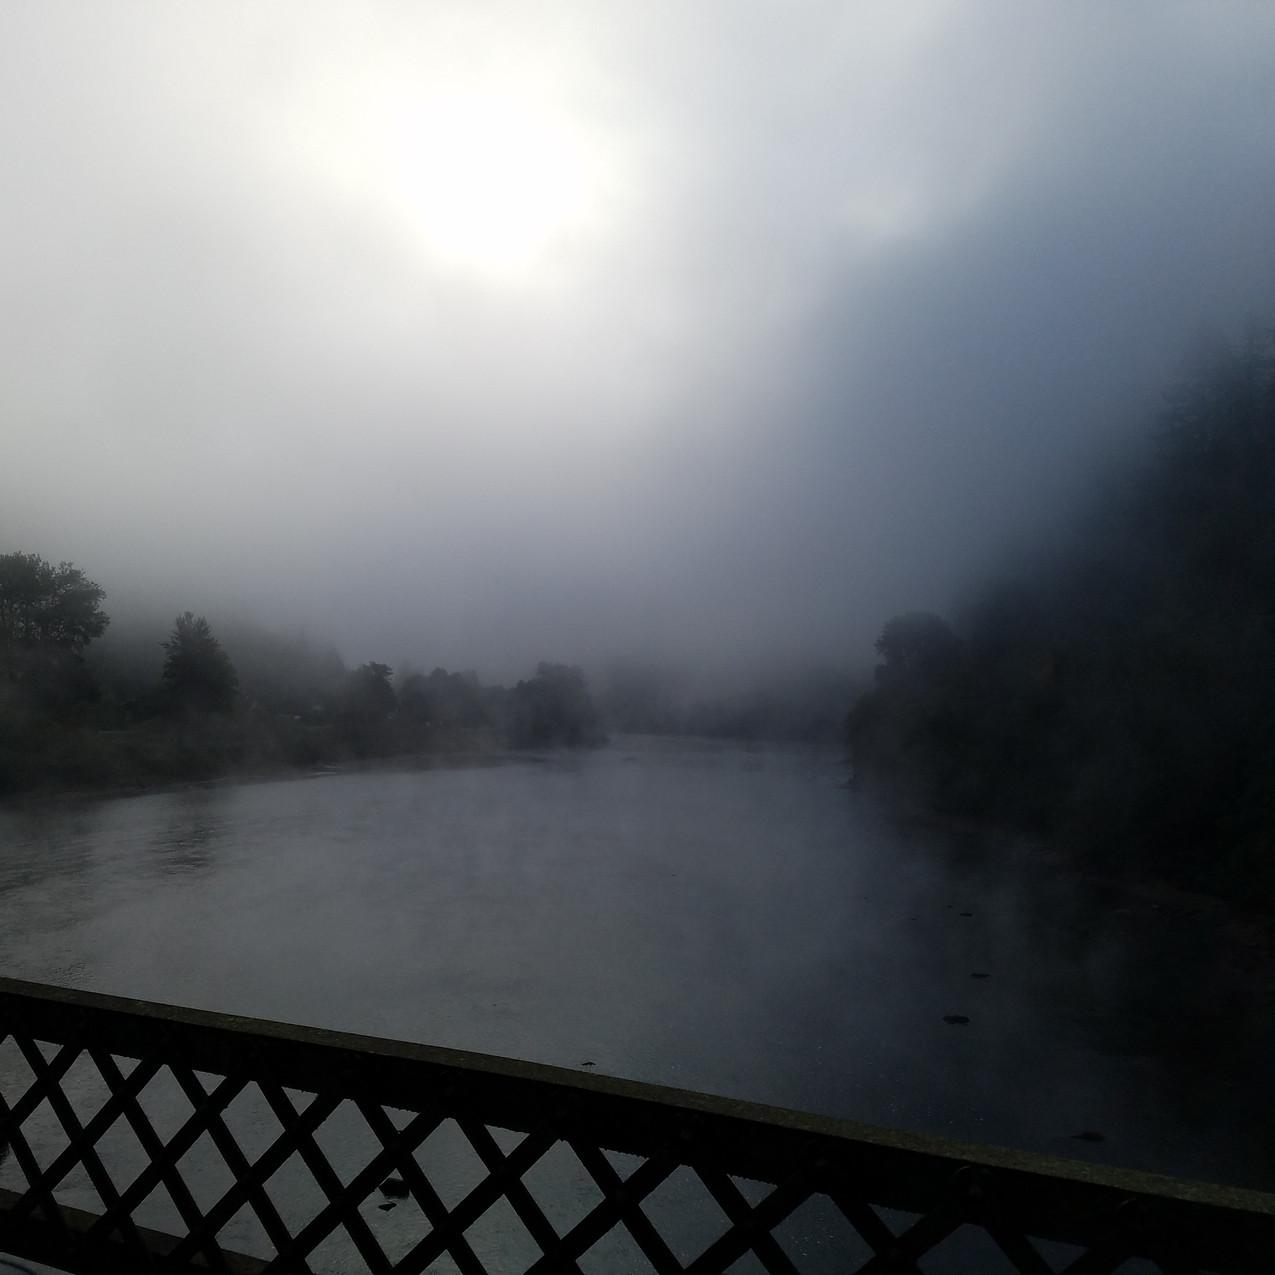 At the Scottsburg Bridge